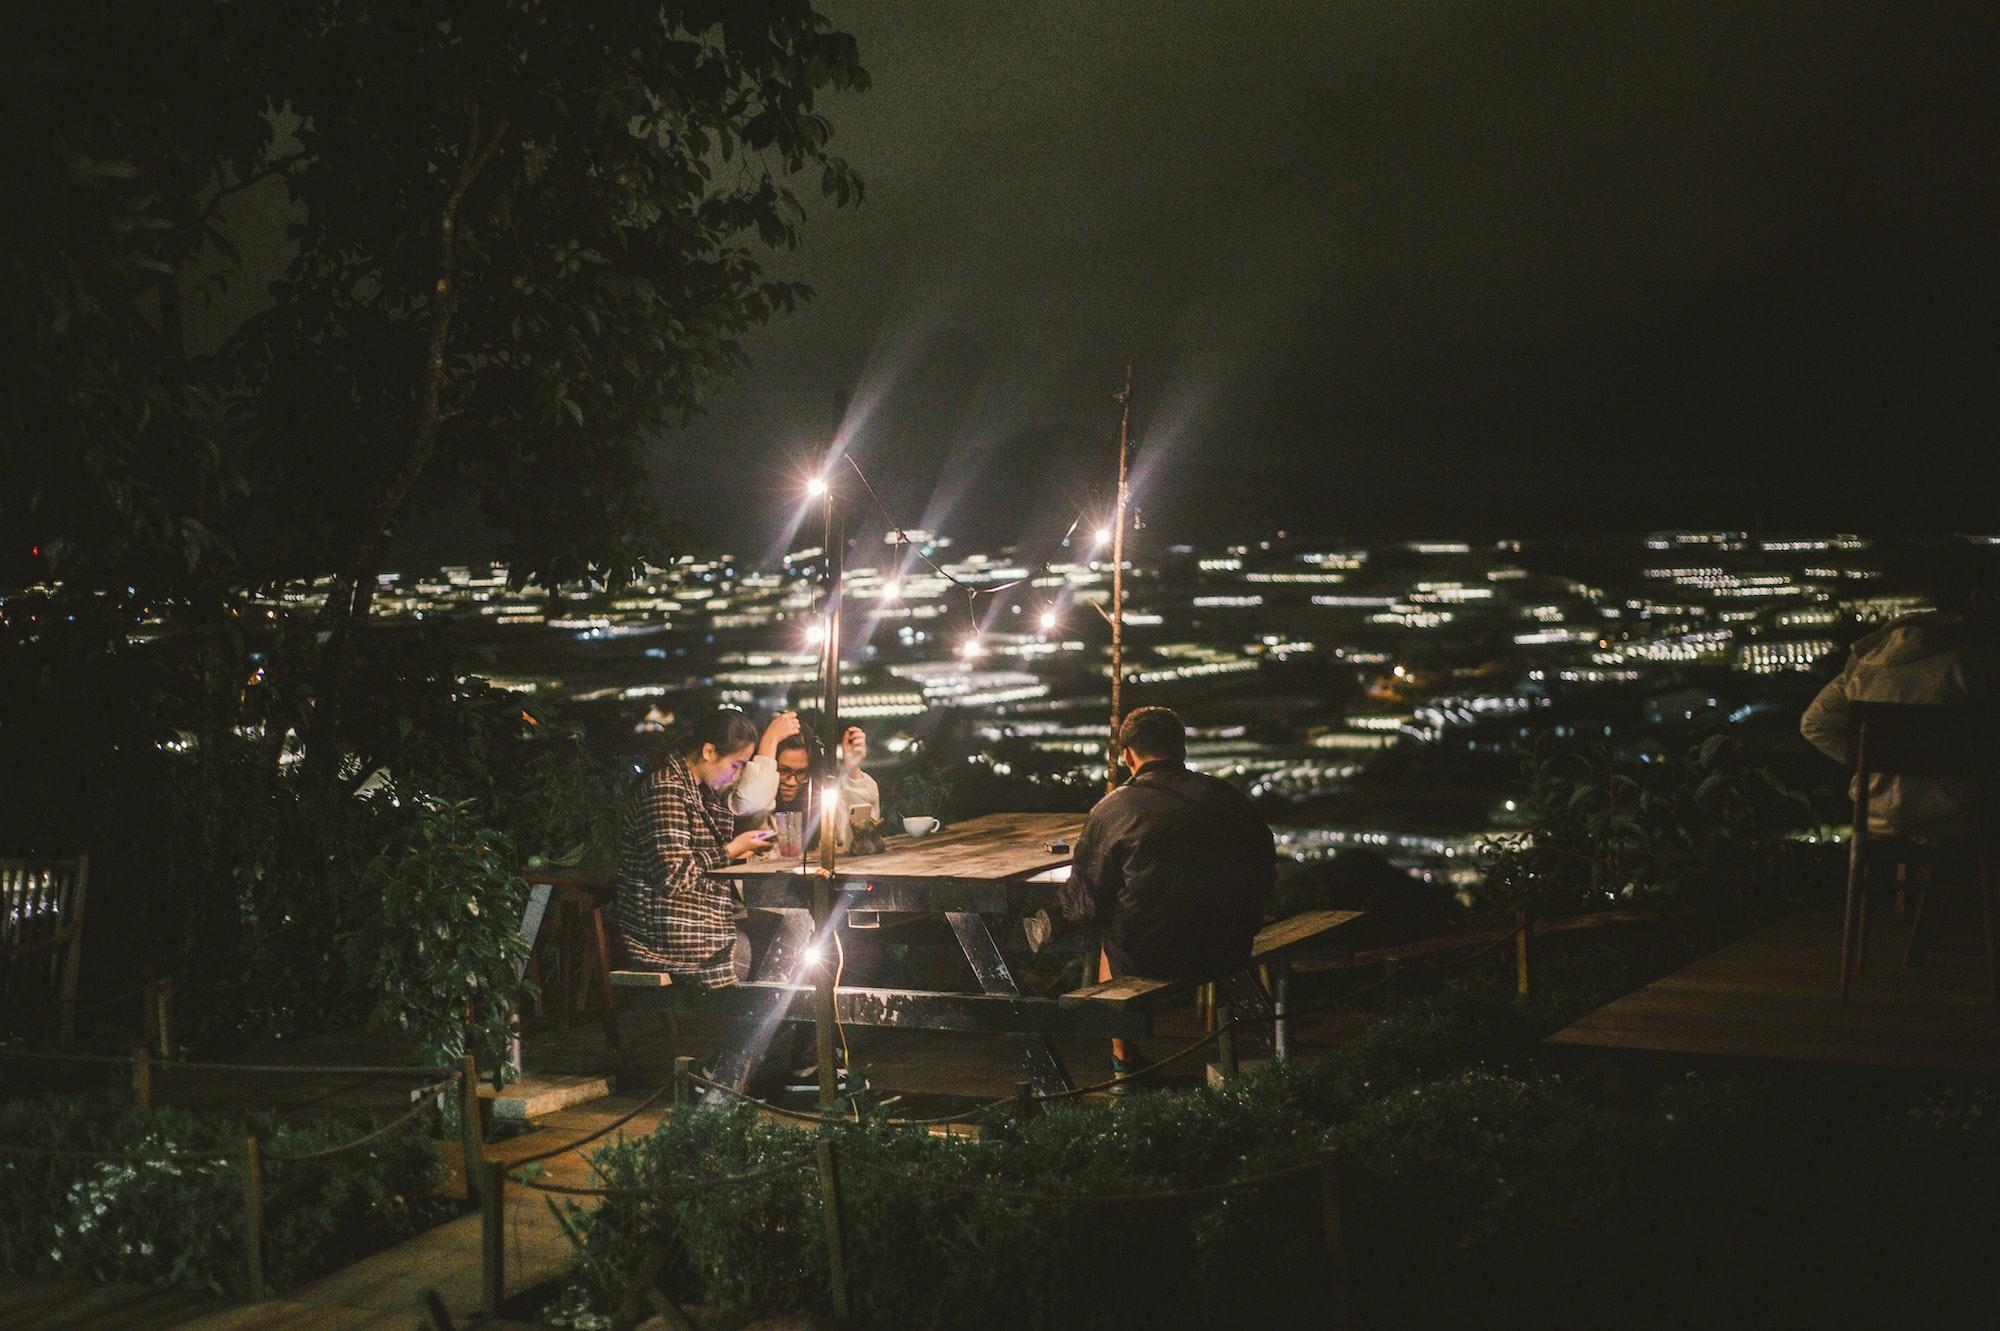 Top 10 romantic things to do in Dalat, Vietnam